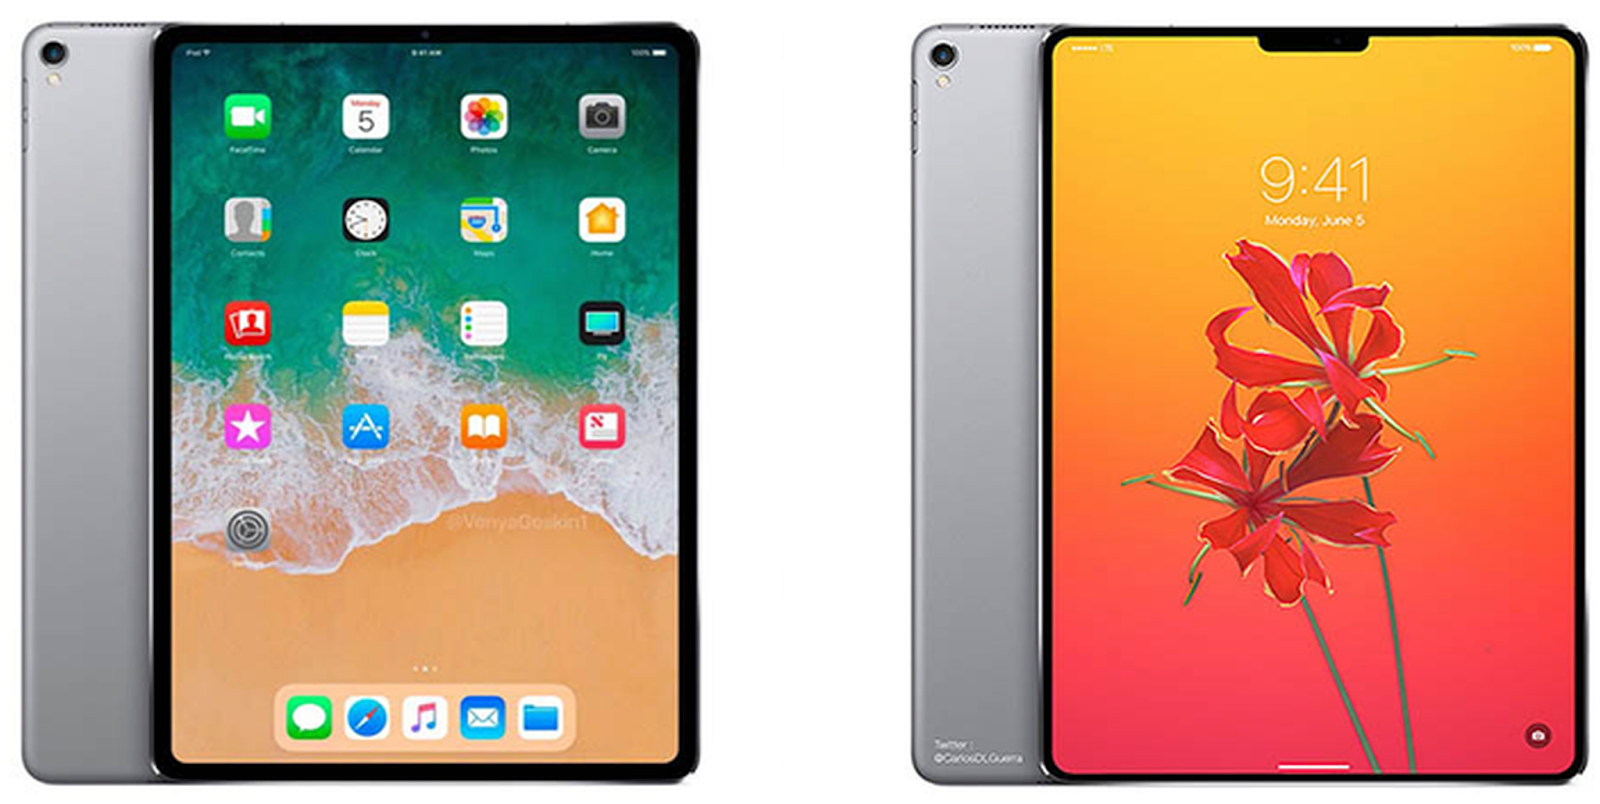 iPad X Pro User Guide iPad Pro User Guide ipad pro user guide ios 10 ipad